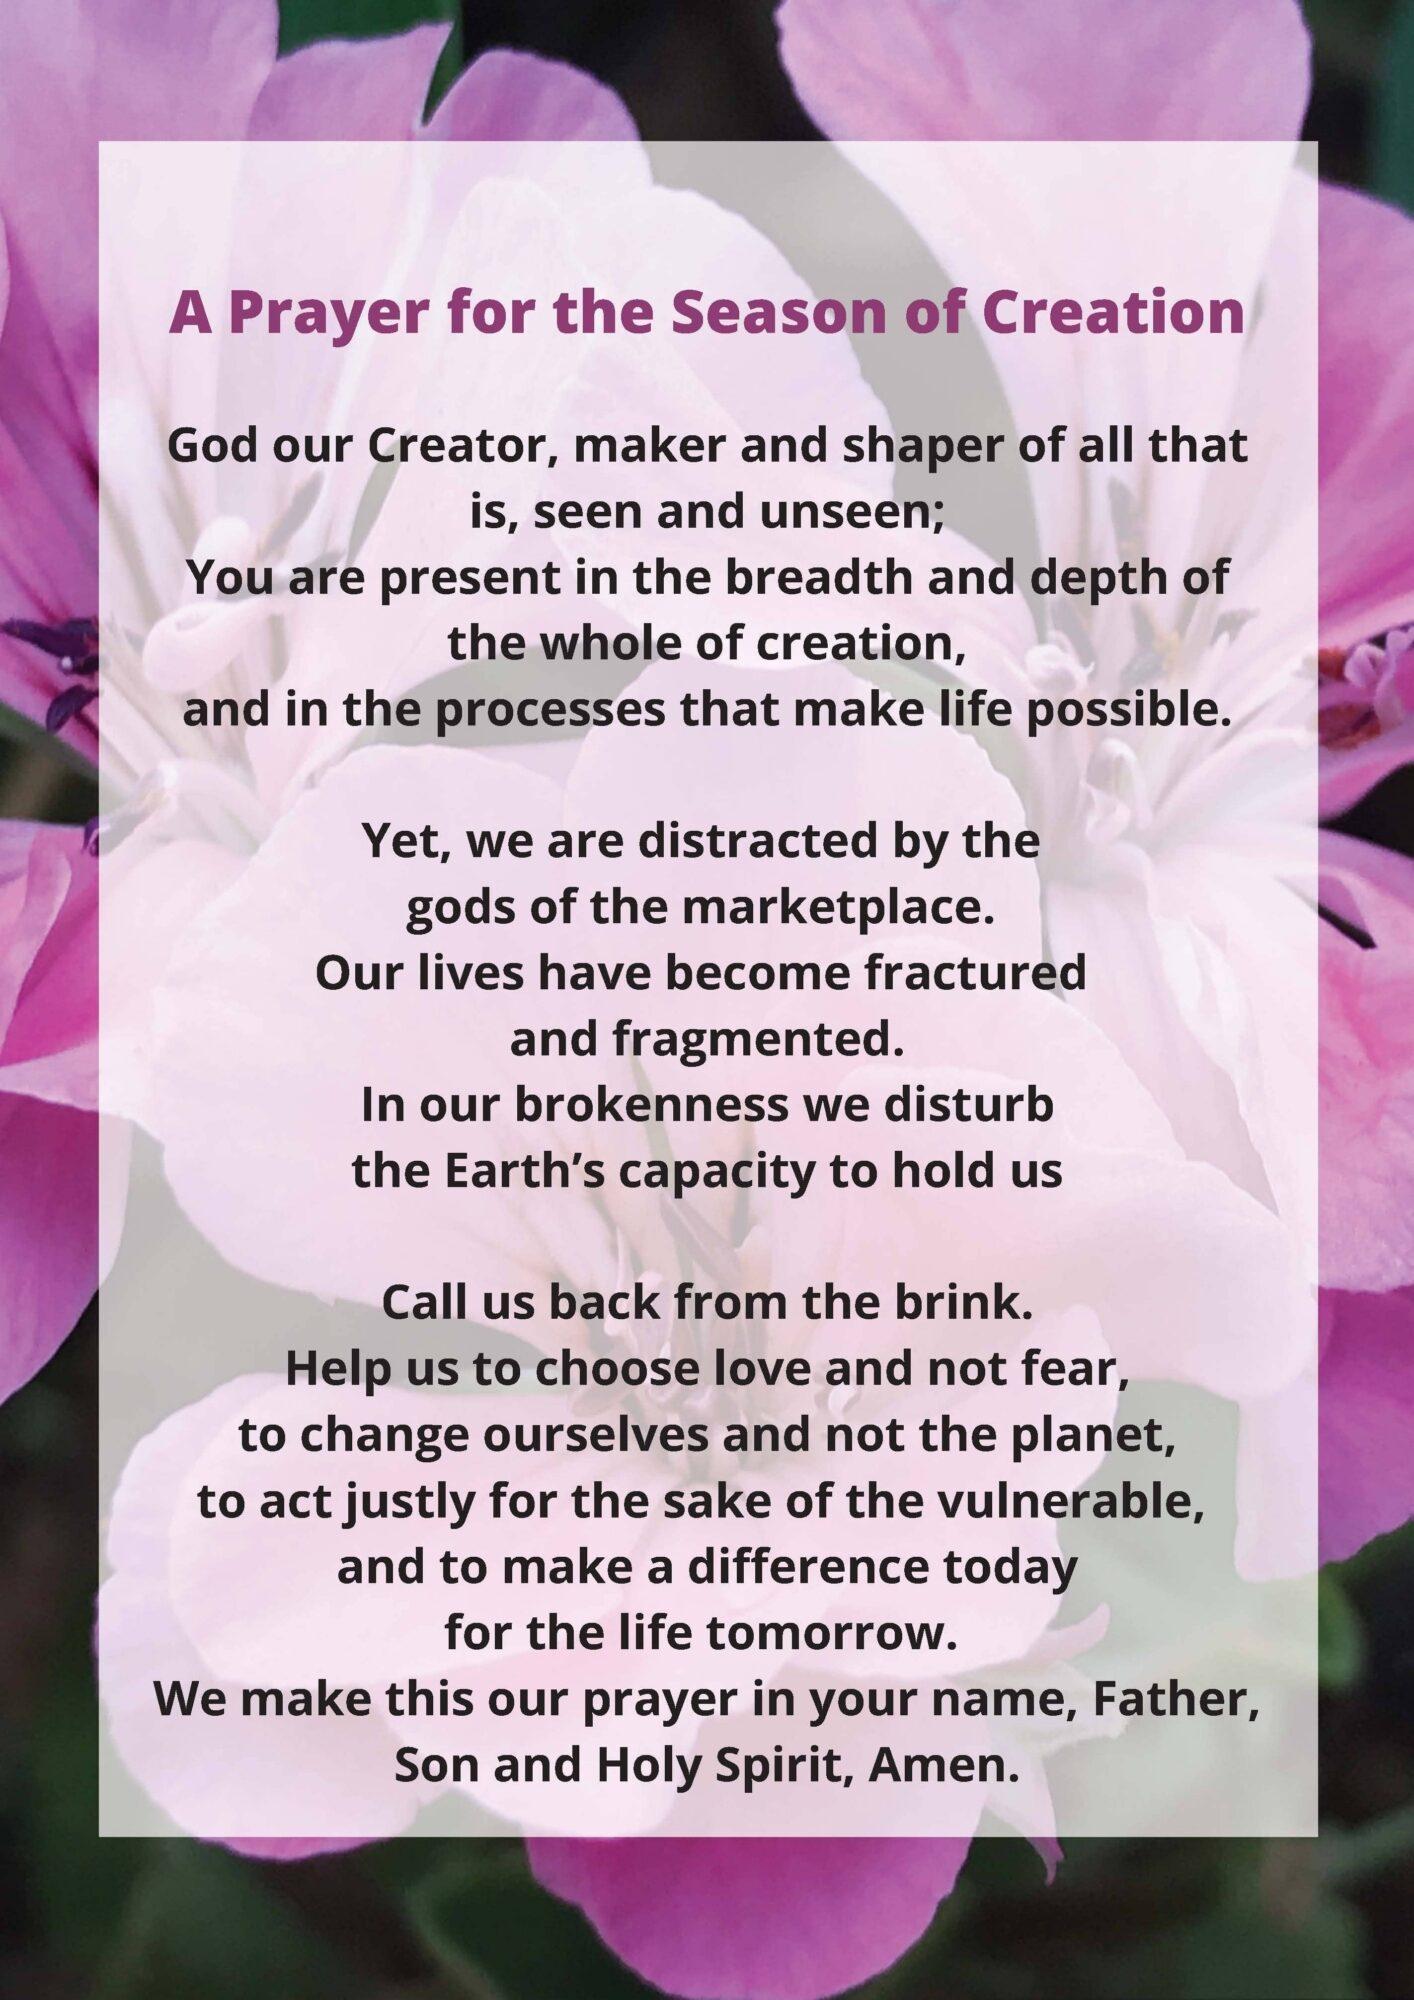 Eco Care Prayer for Season of Creation